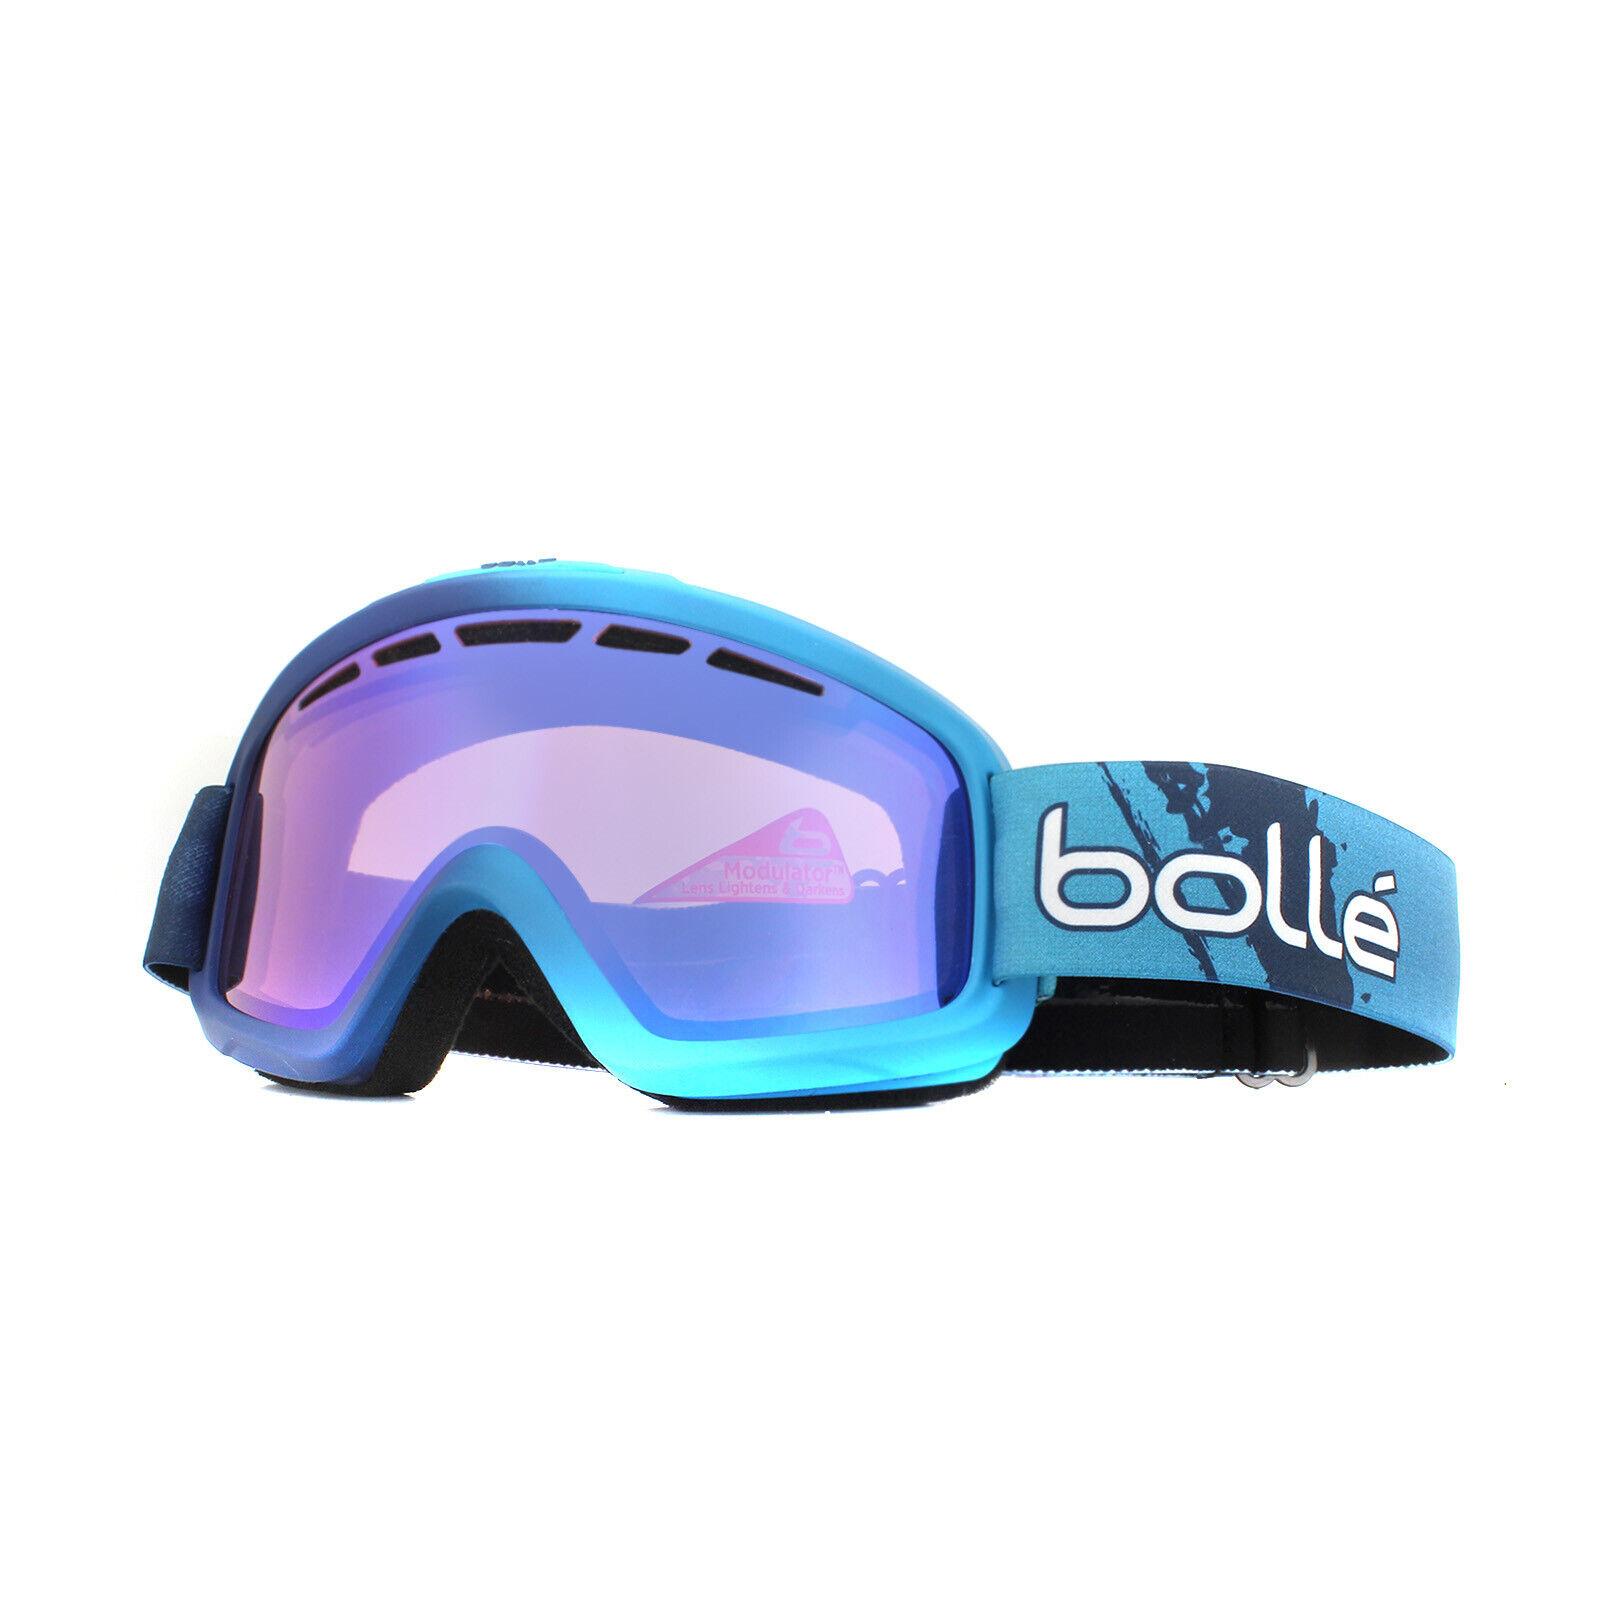 Bolle Skibrille Nova II 21850 Matt Blau Gradient Aurora Blau